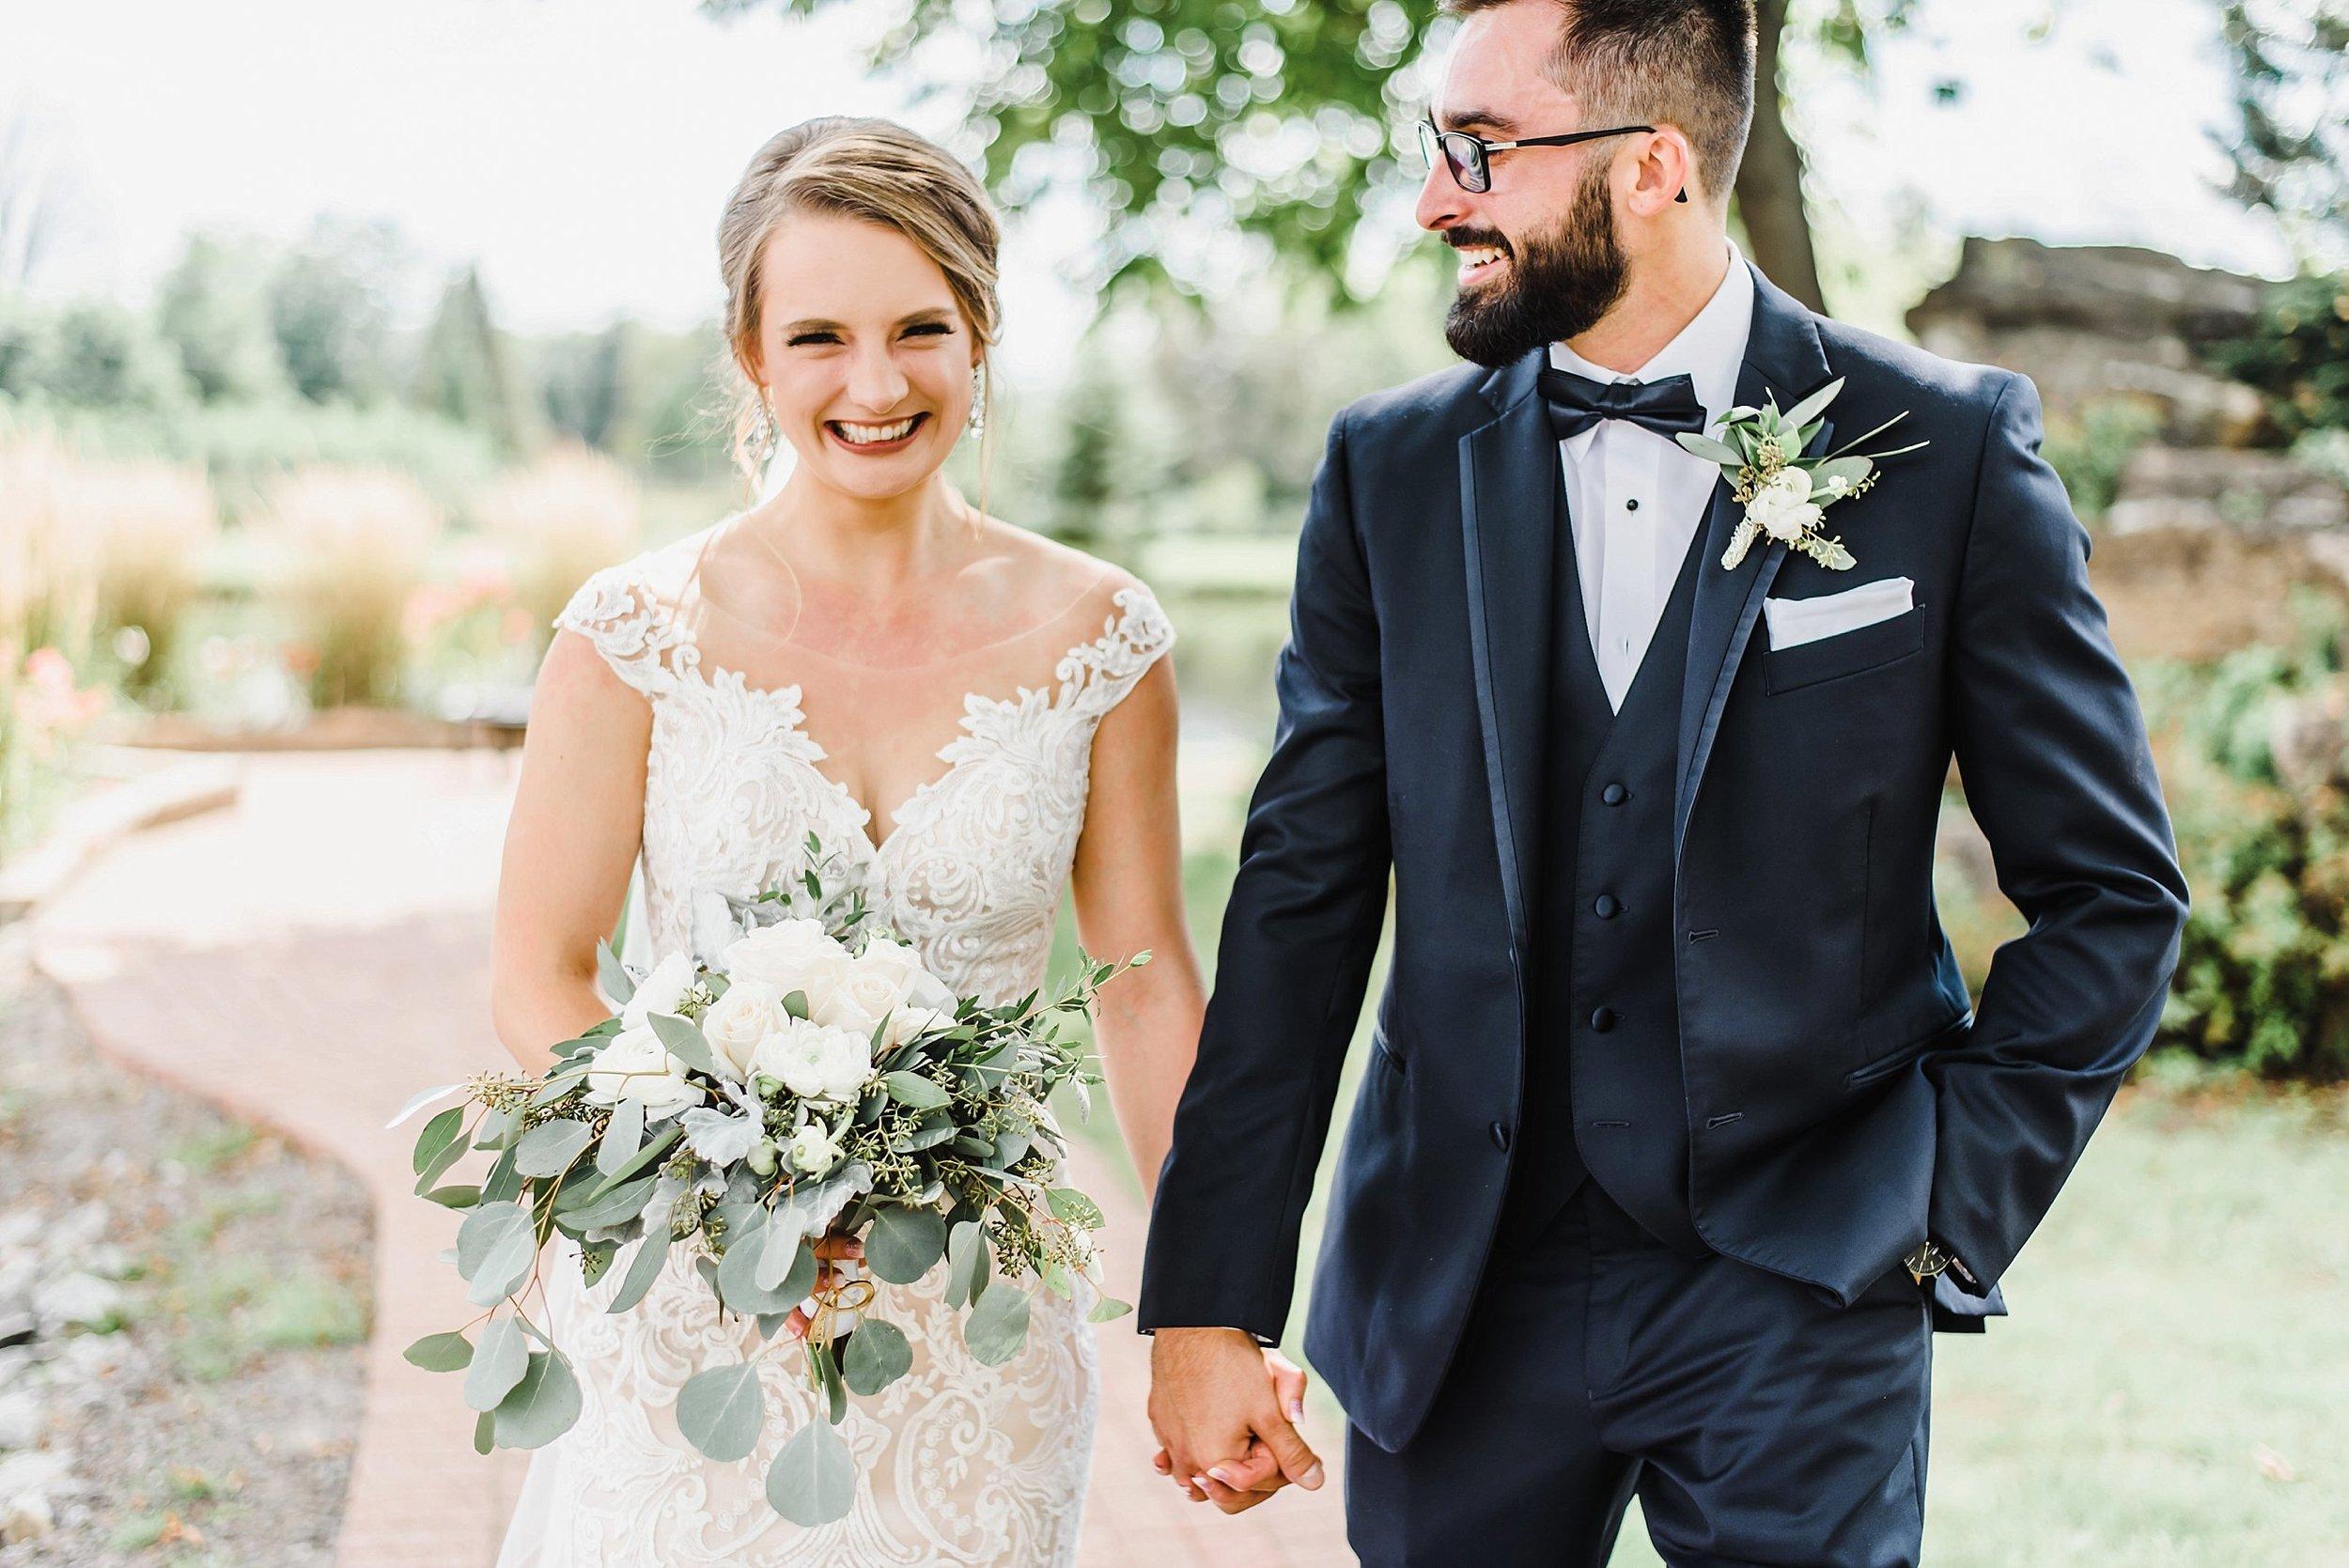 light airy indie fine art ottawa wedding photographer | Ali and Batoul Photography_1254.jpg